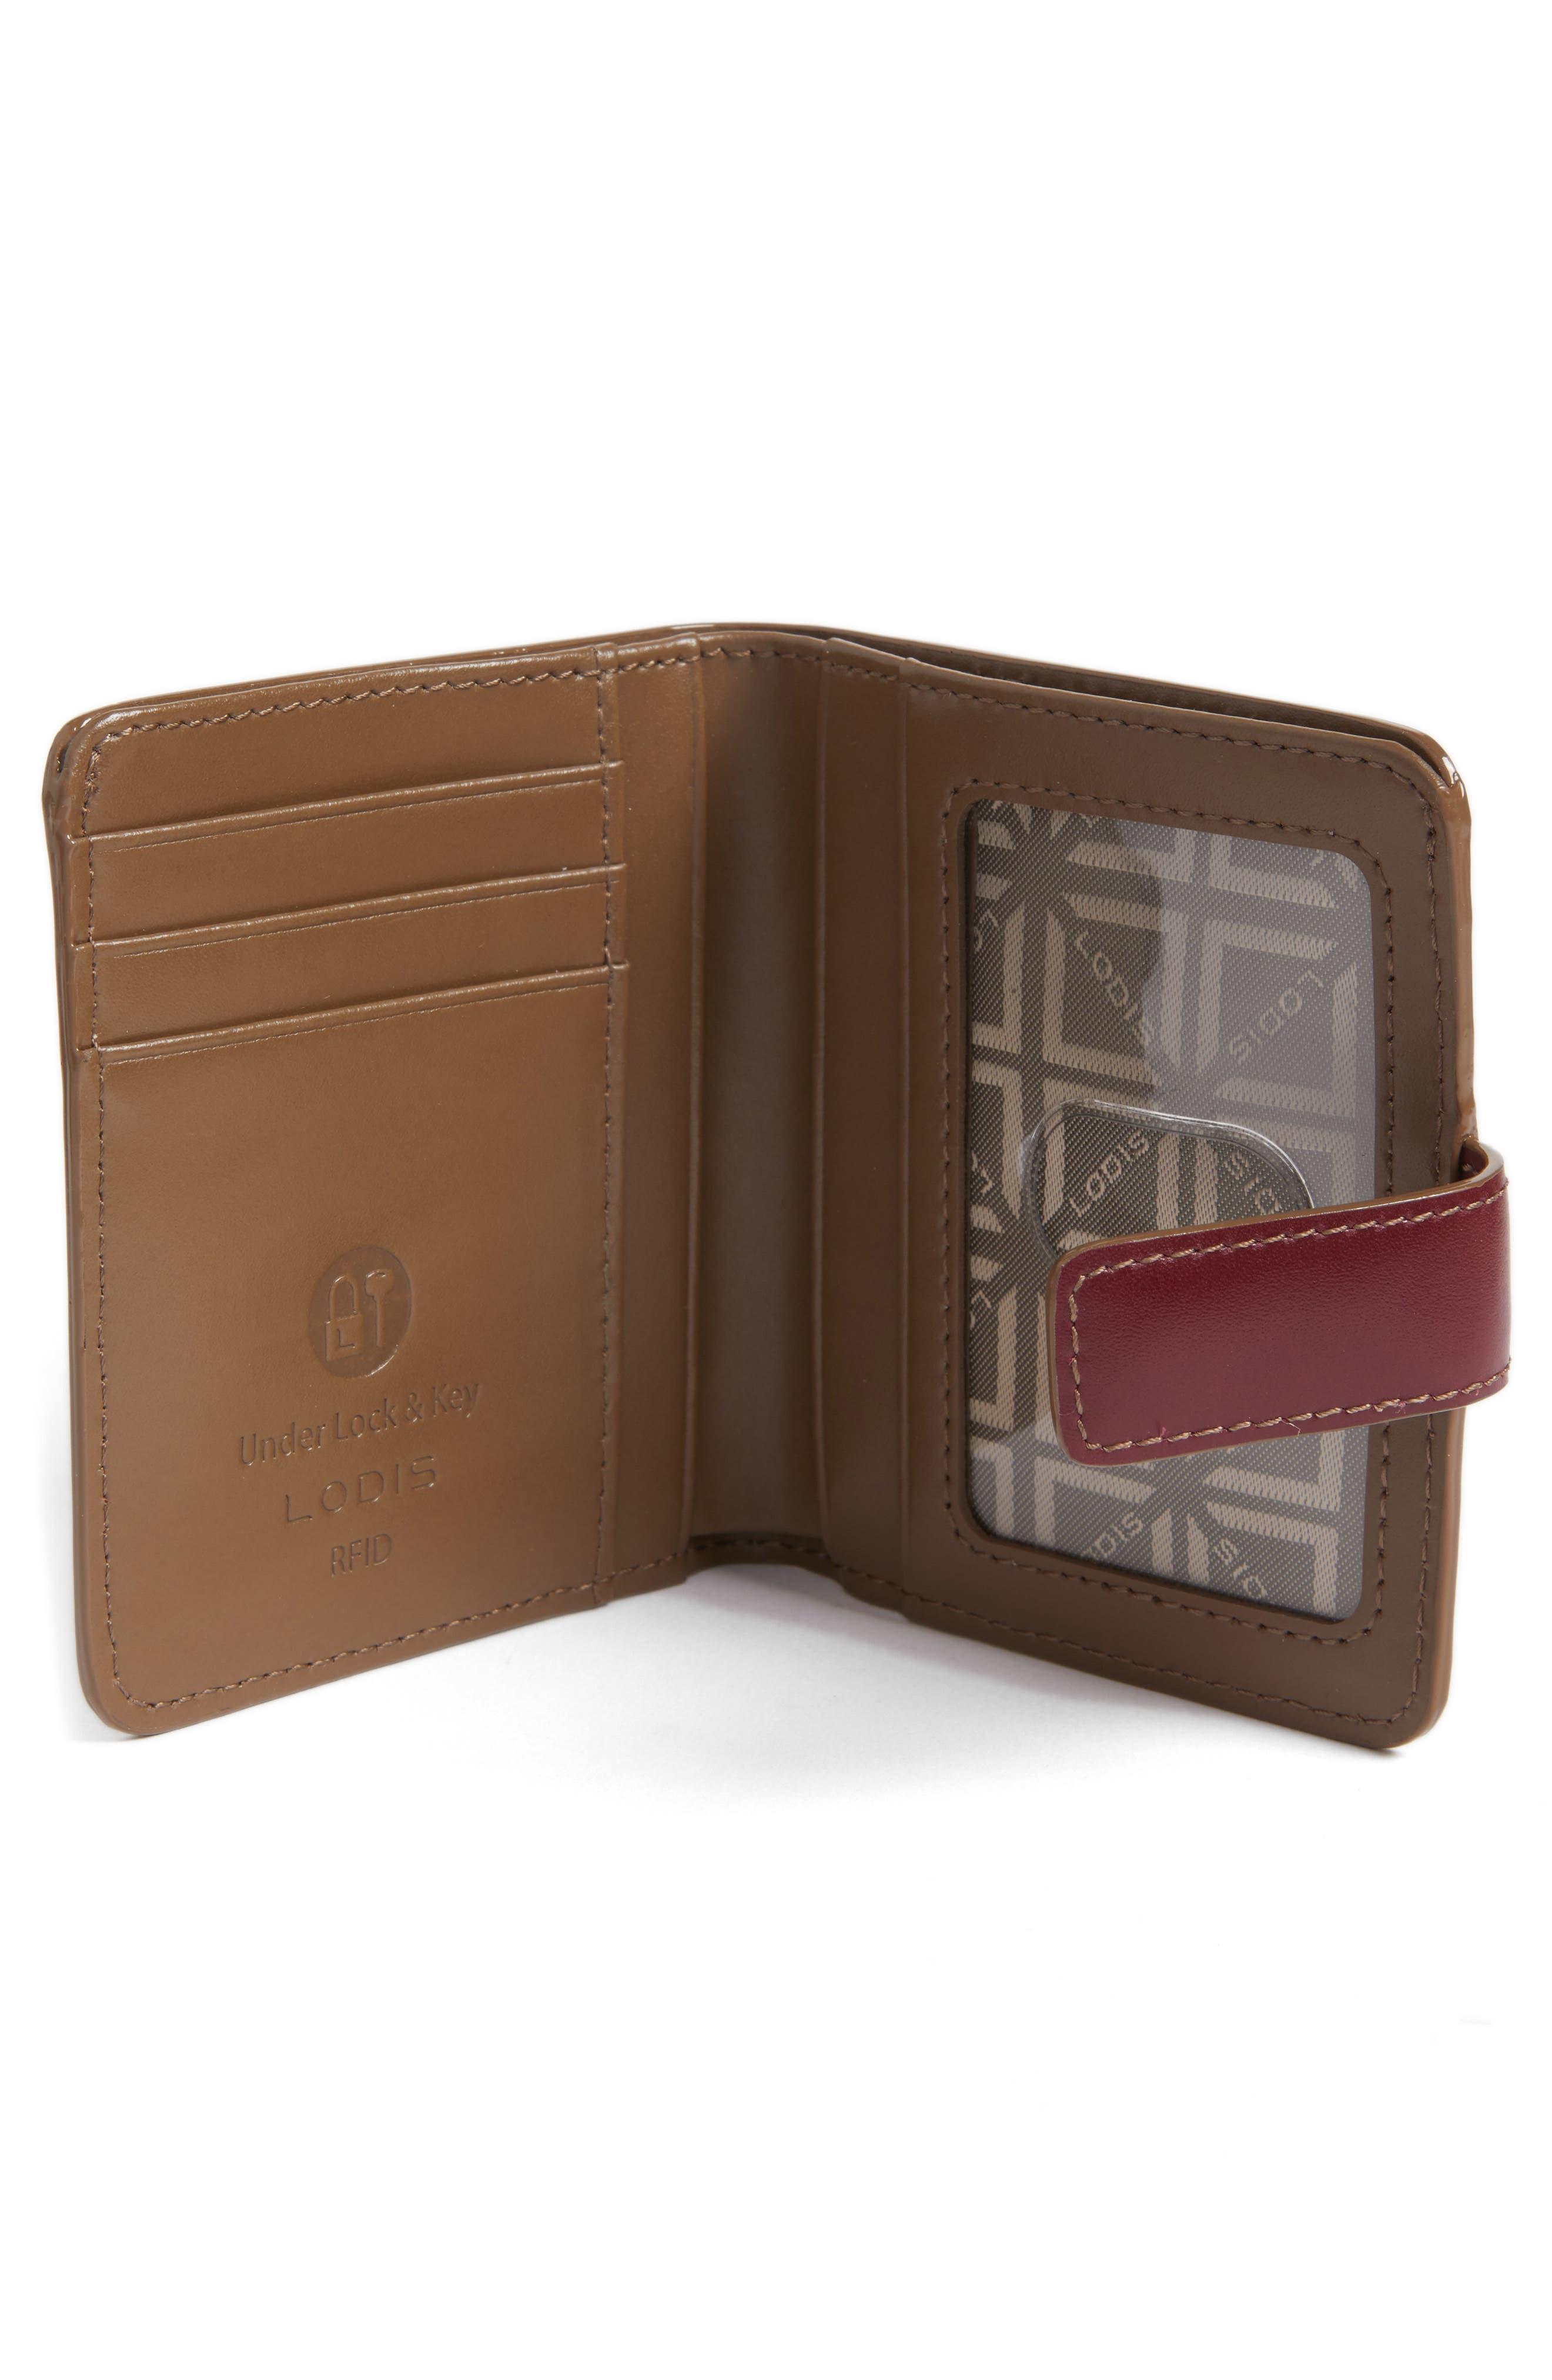 Lodis Petite Audrey RFID Leather Wallet,                             Alternate thumbnail 6, color,